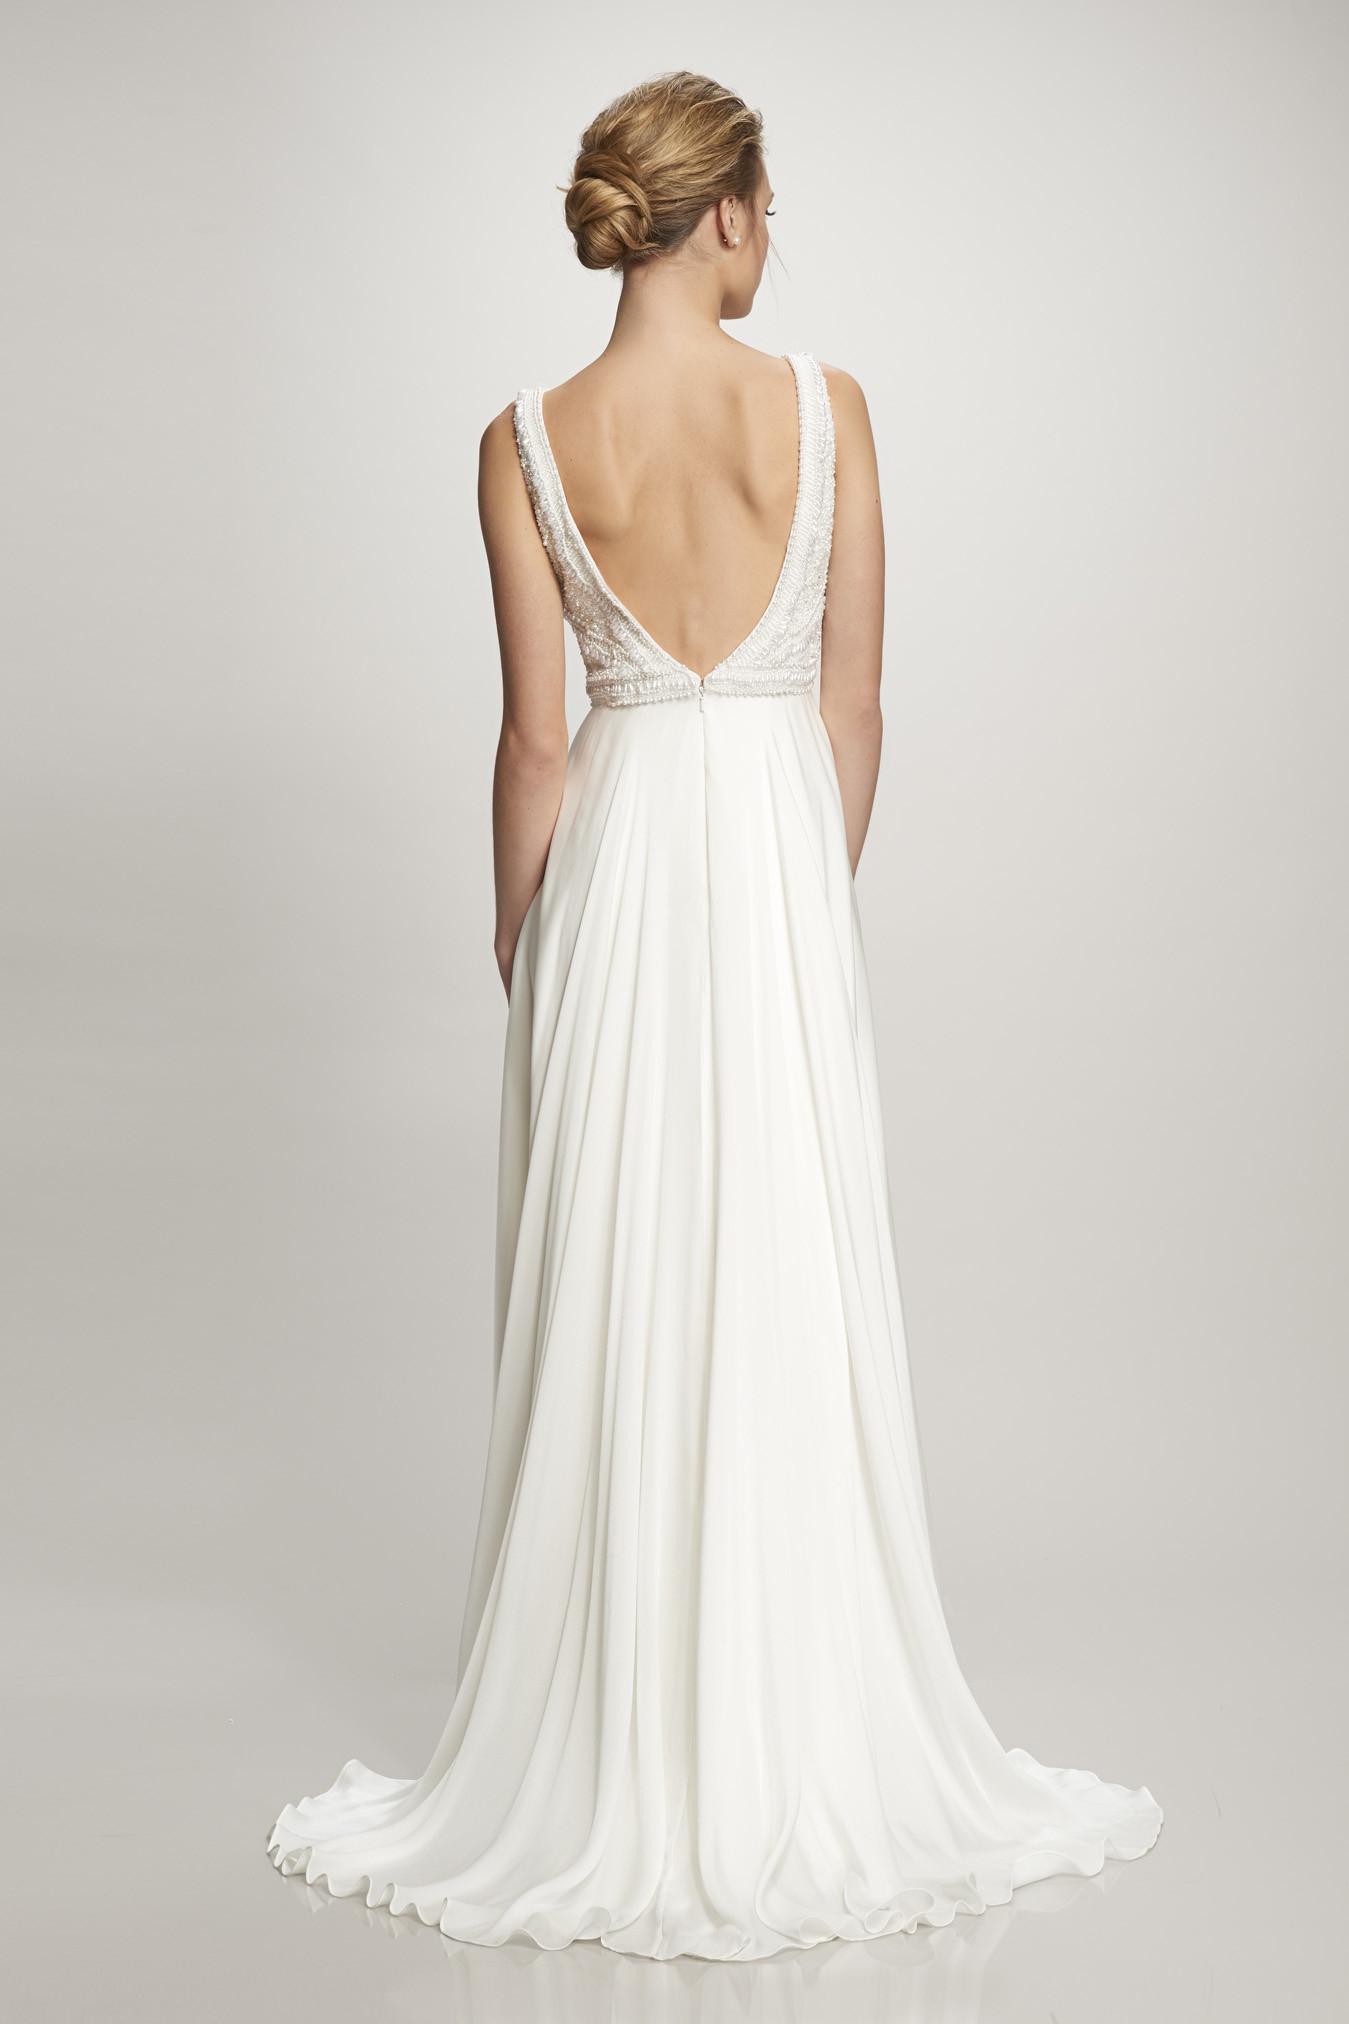 Theia Couture Nava New Wedding Dresses Stillwhite